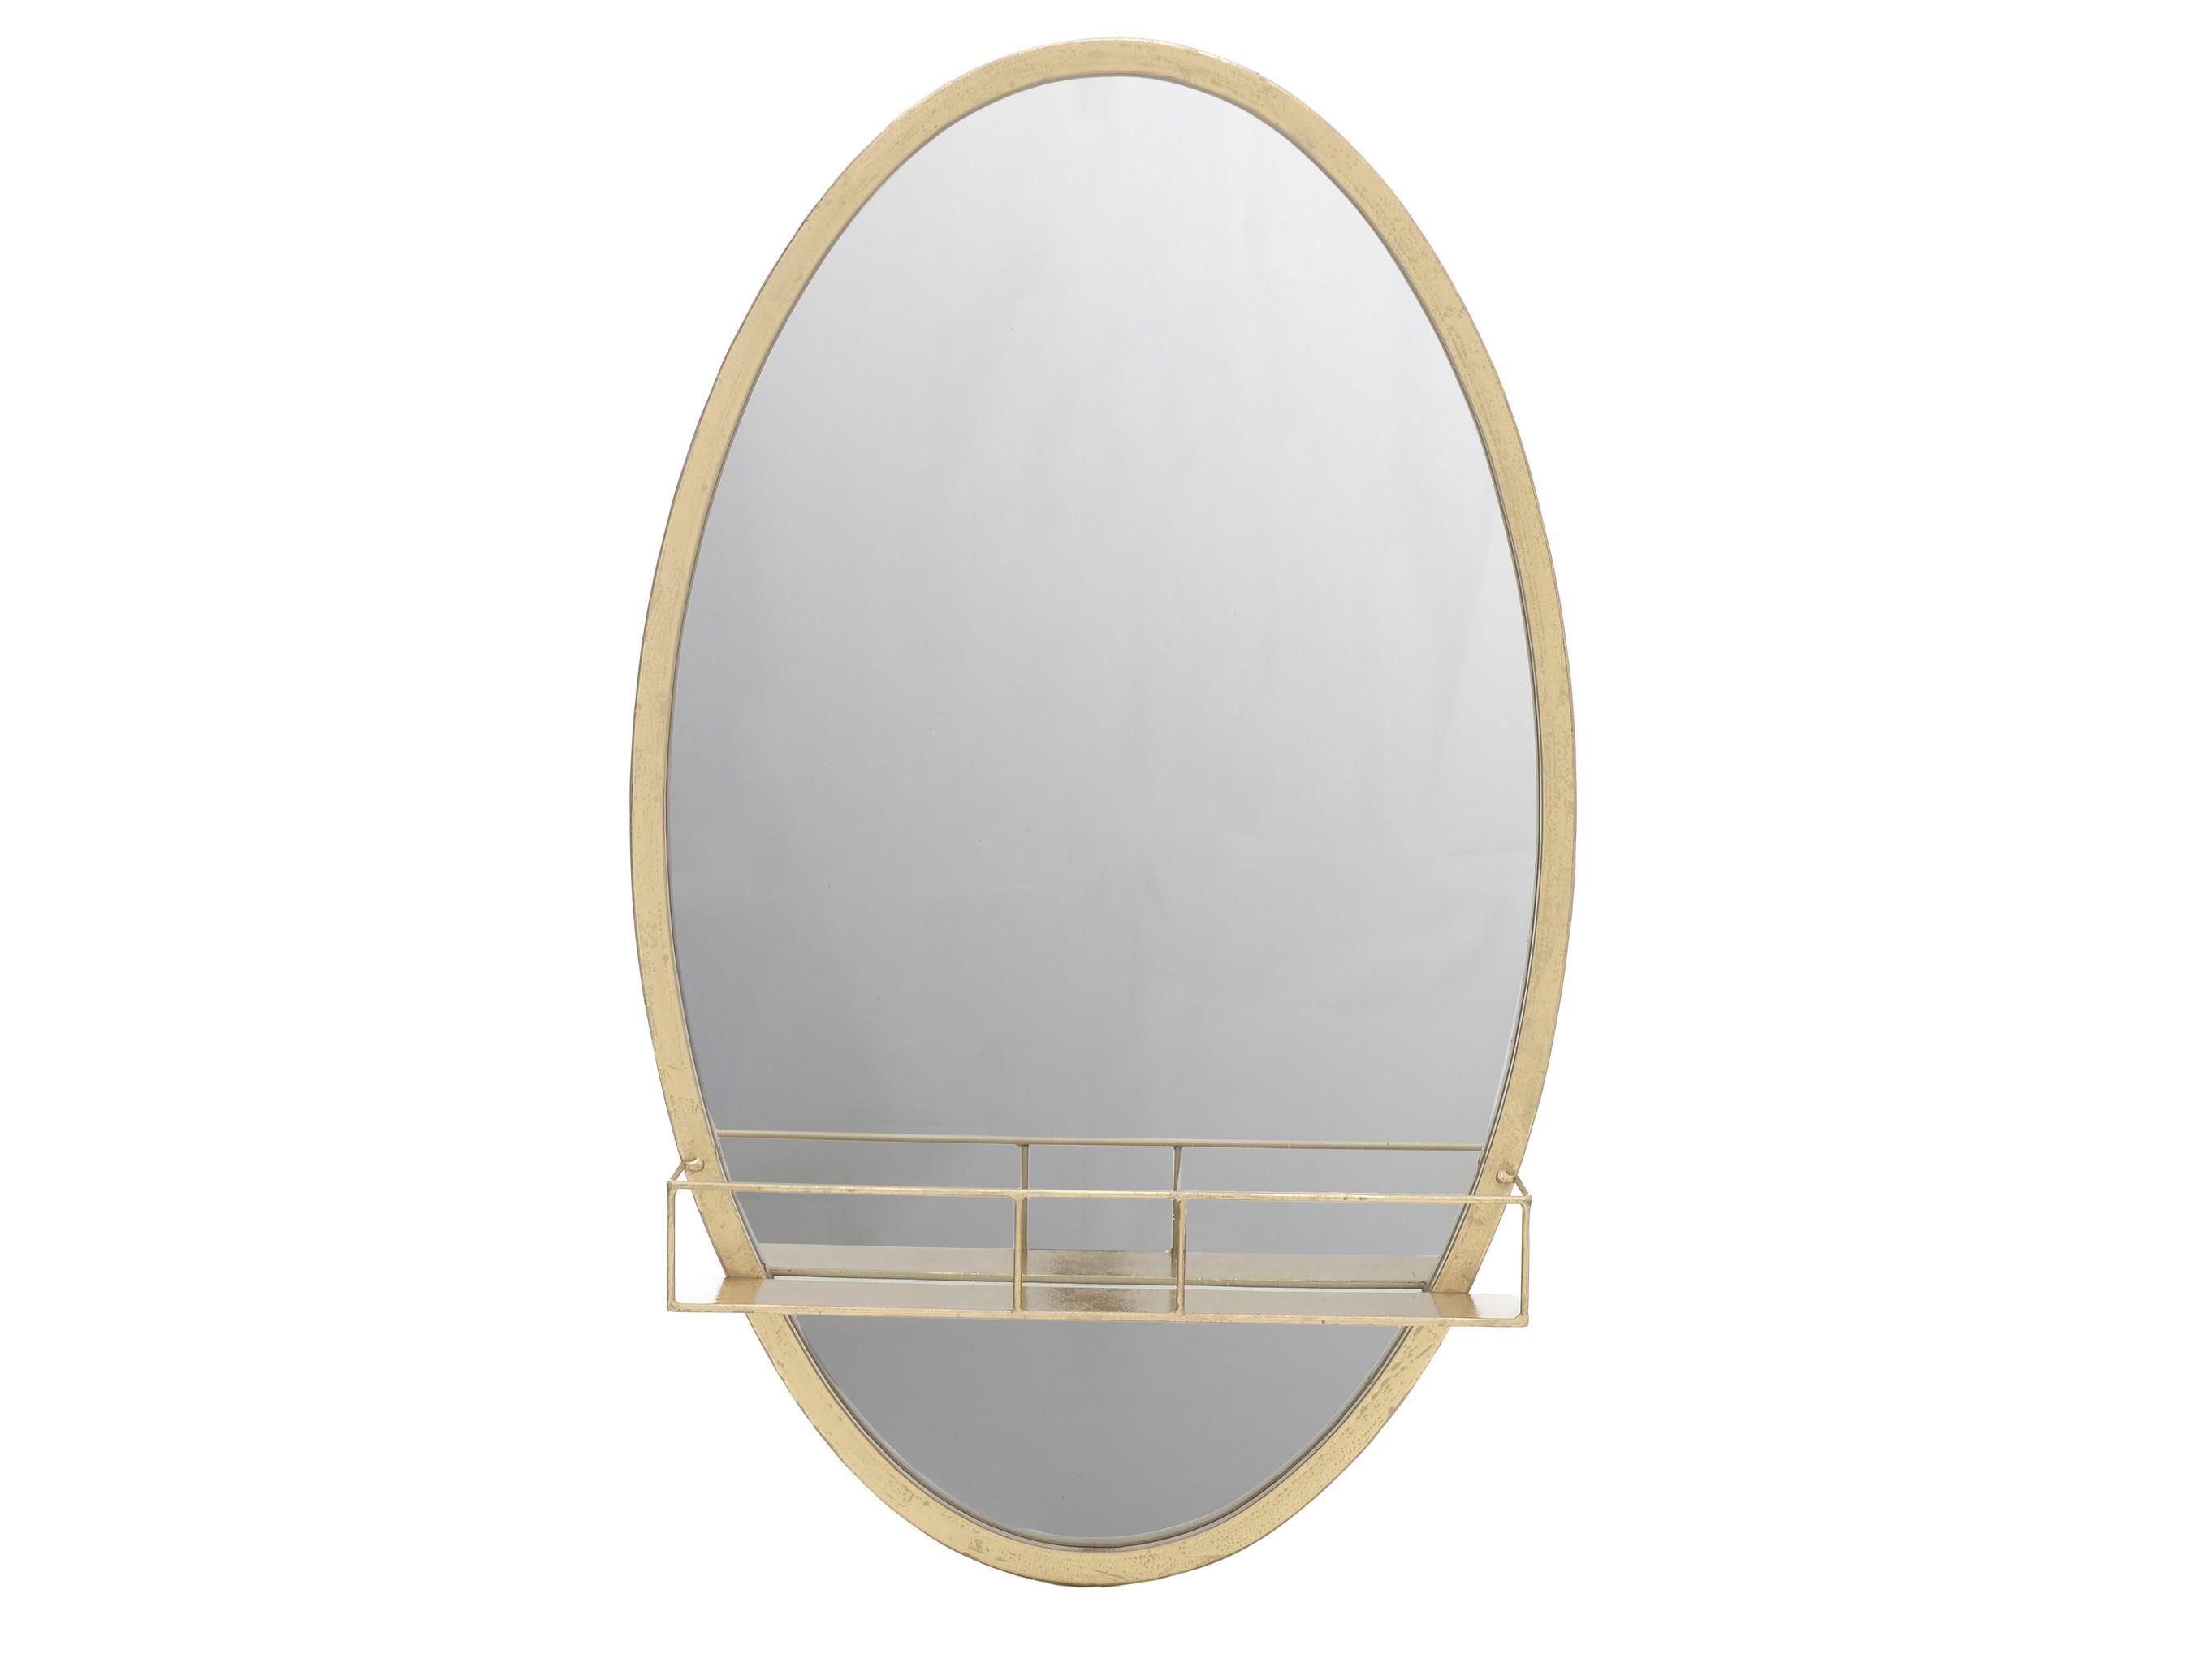 Зеркало с полкой teofilo (to4rooms) бронзовый 41.0x66.0x9.0 см.